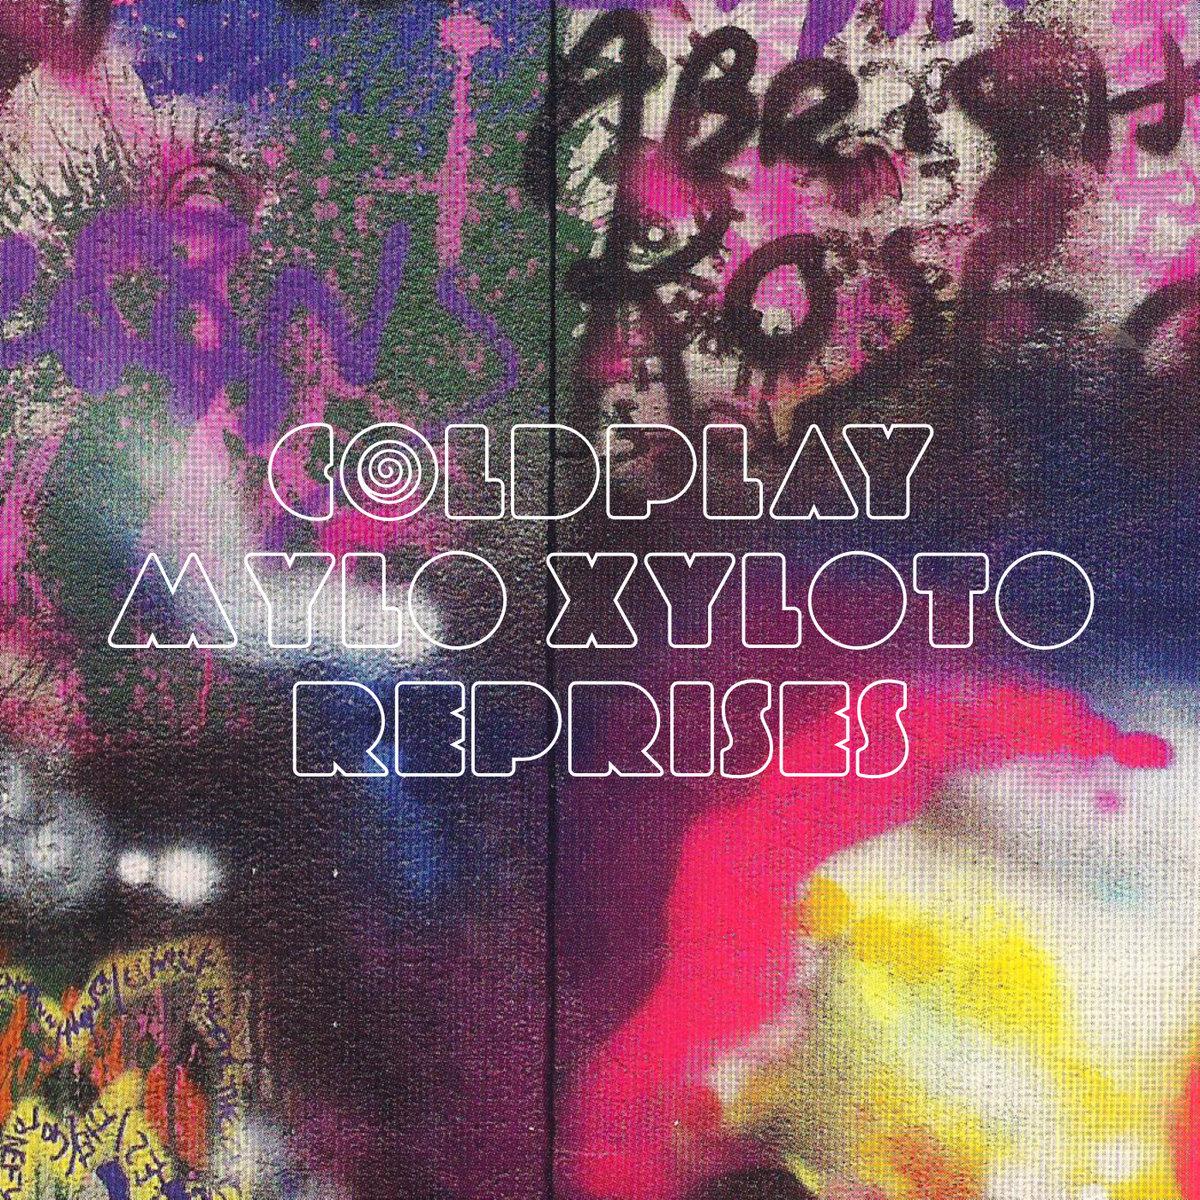 MYLO GRATIS COLDPLAY BAIXAR XYLOTO CD